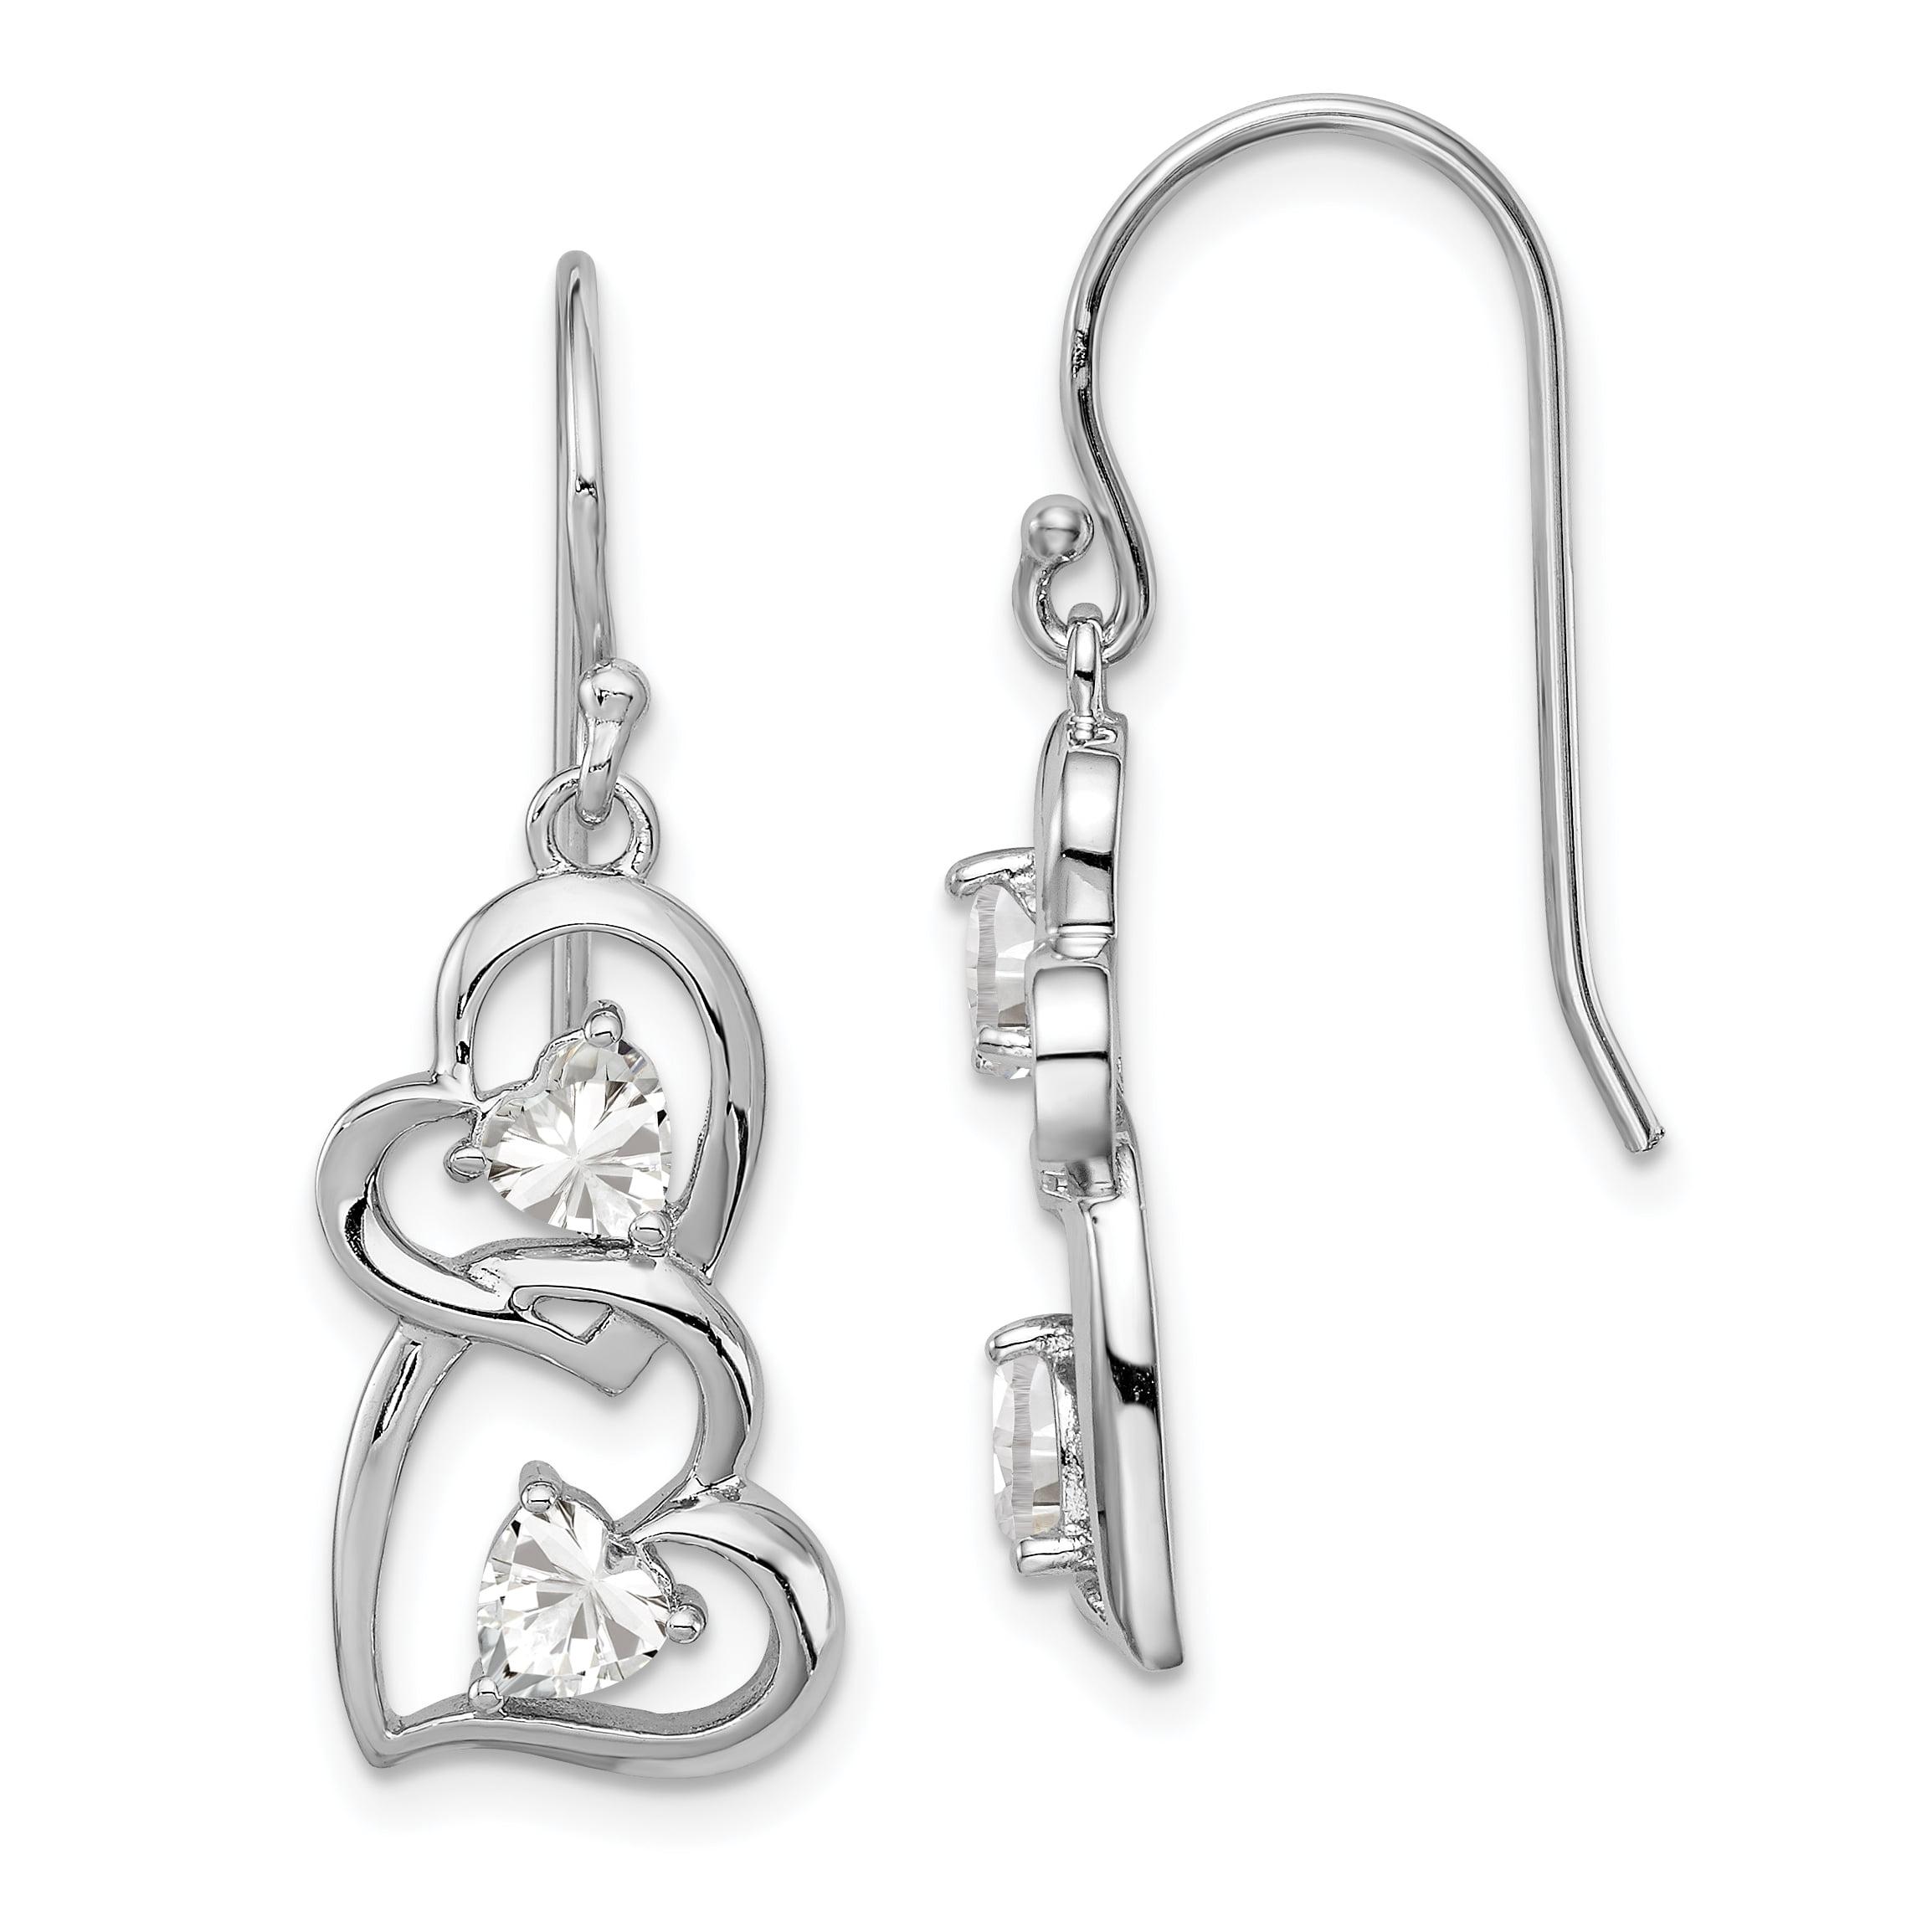 925 Sterling Silver Round Cubic Zirconia Cz Stud Heart Jacket Earrings Drop Dangle Love Fine Jewelry Gifts For Women For Her